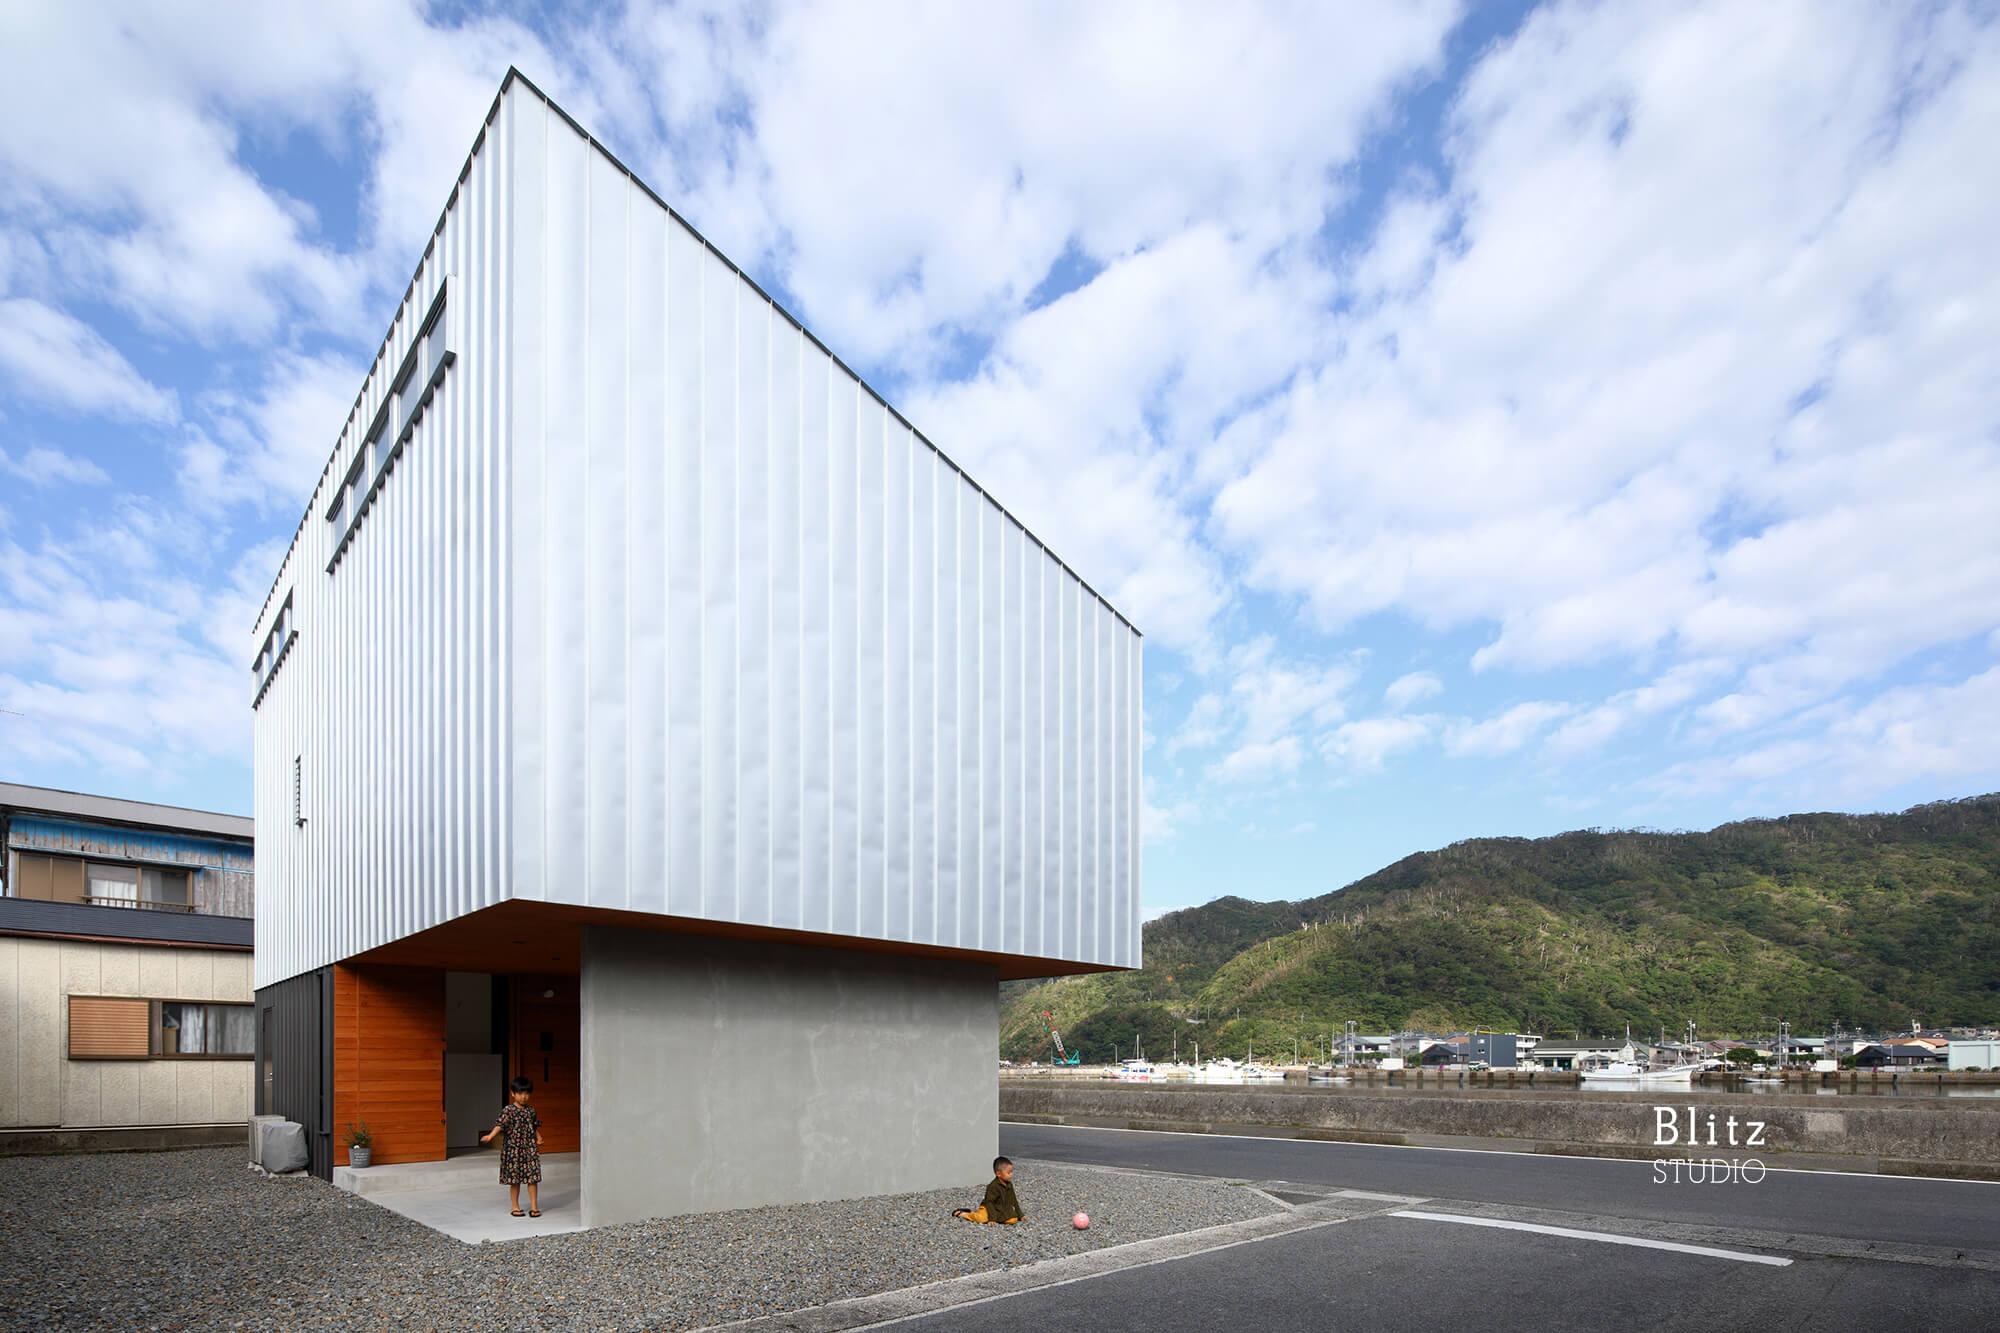 『名瀬鳩浜の家』-鹿児島県奄美大島-建築写真・竣工写真・インテリア写真2